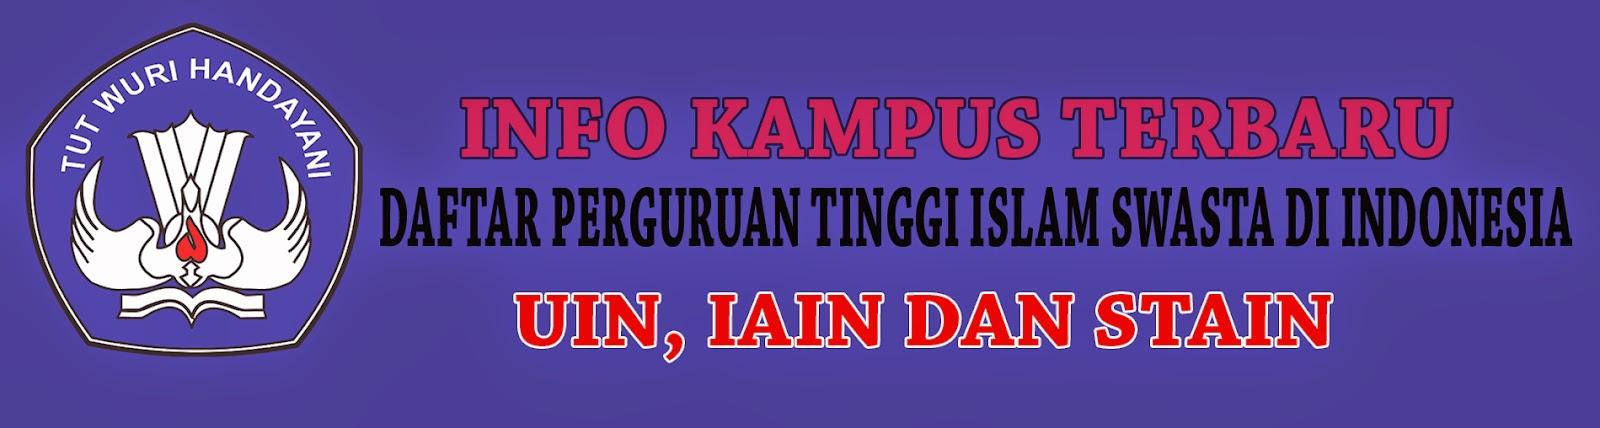 Daftar Perguruan Tinggi Islam Swasta Di Indonesia